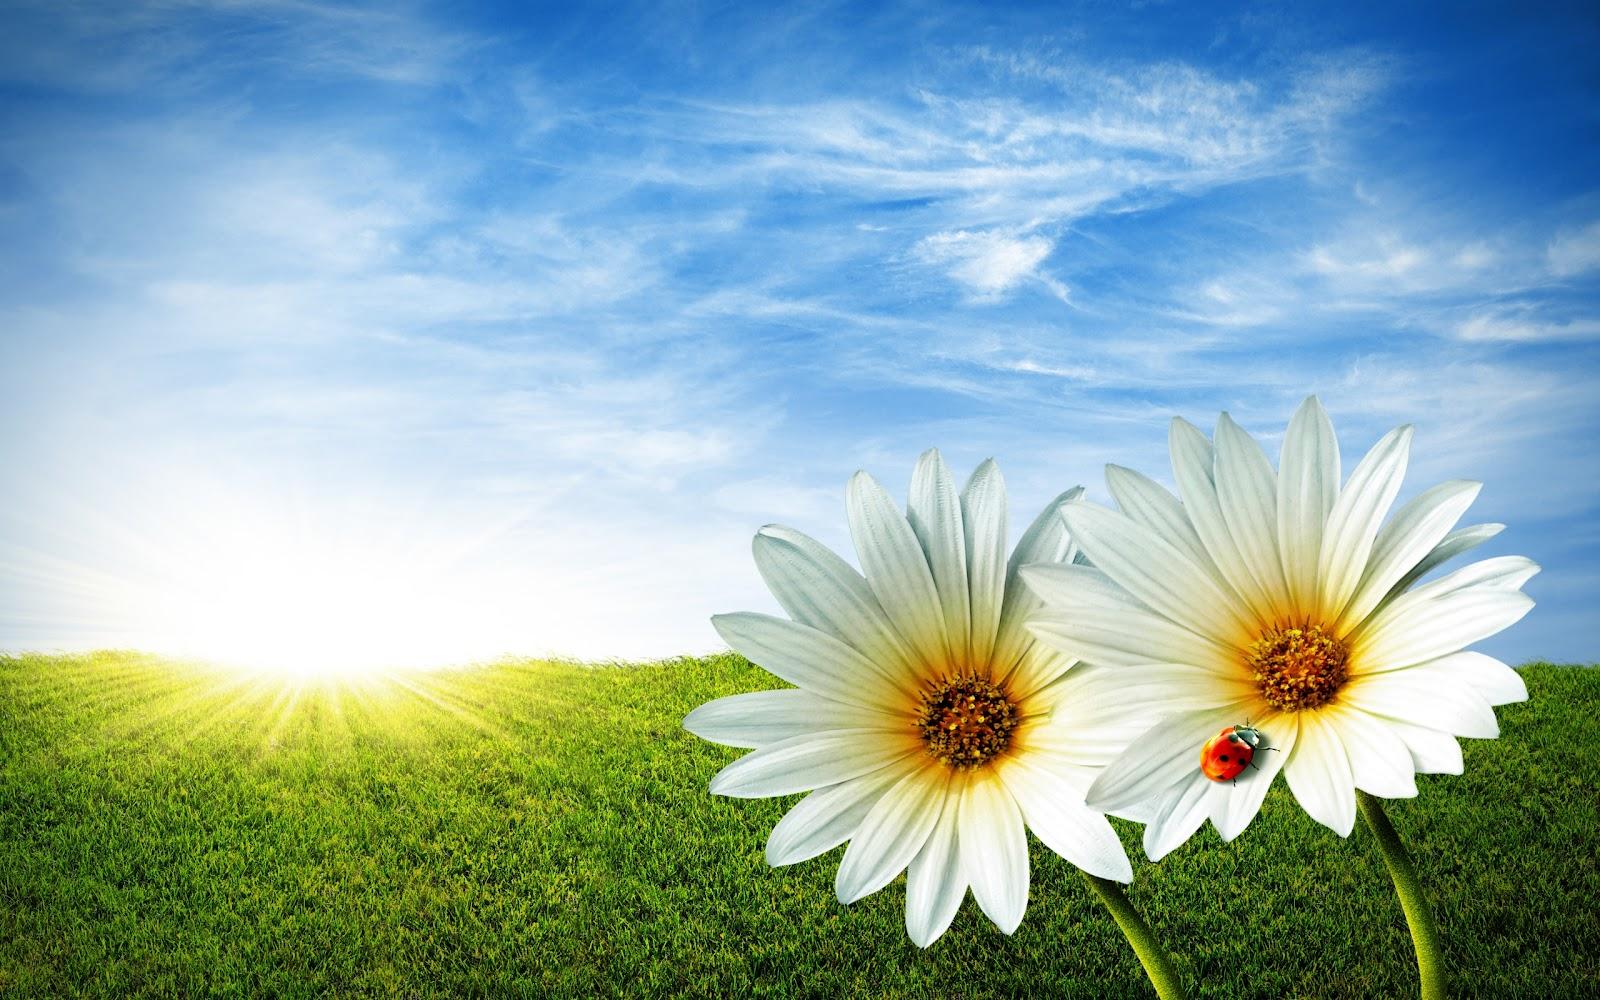 Hd Flower Backgrounds: Flowers For Flower Lovers.: HD Flowers Wallpapers